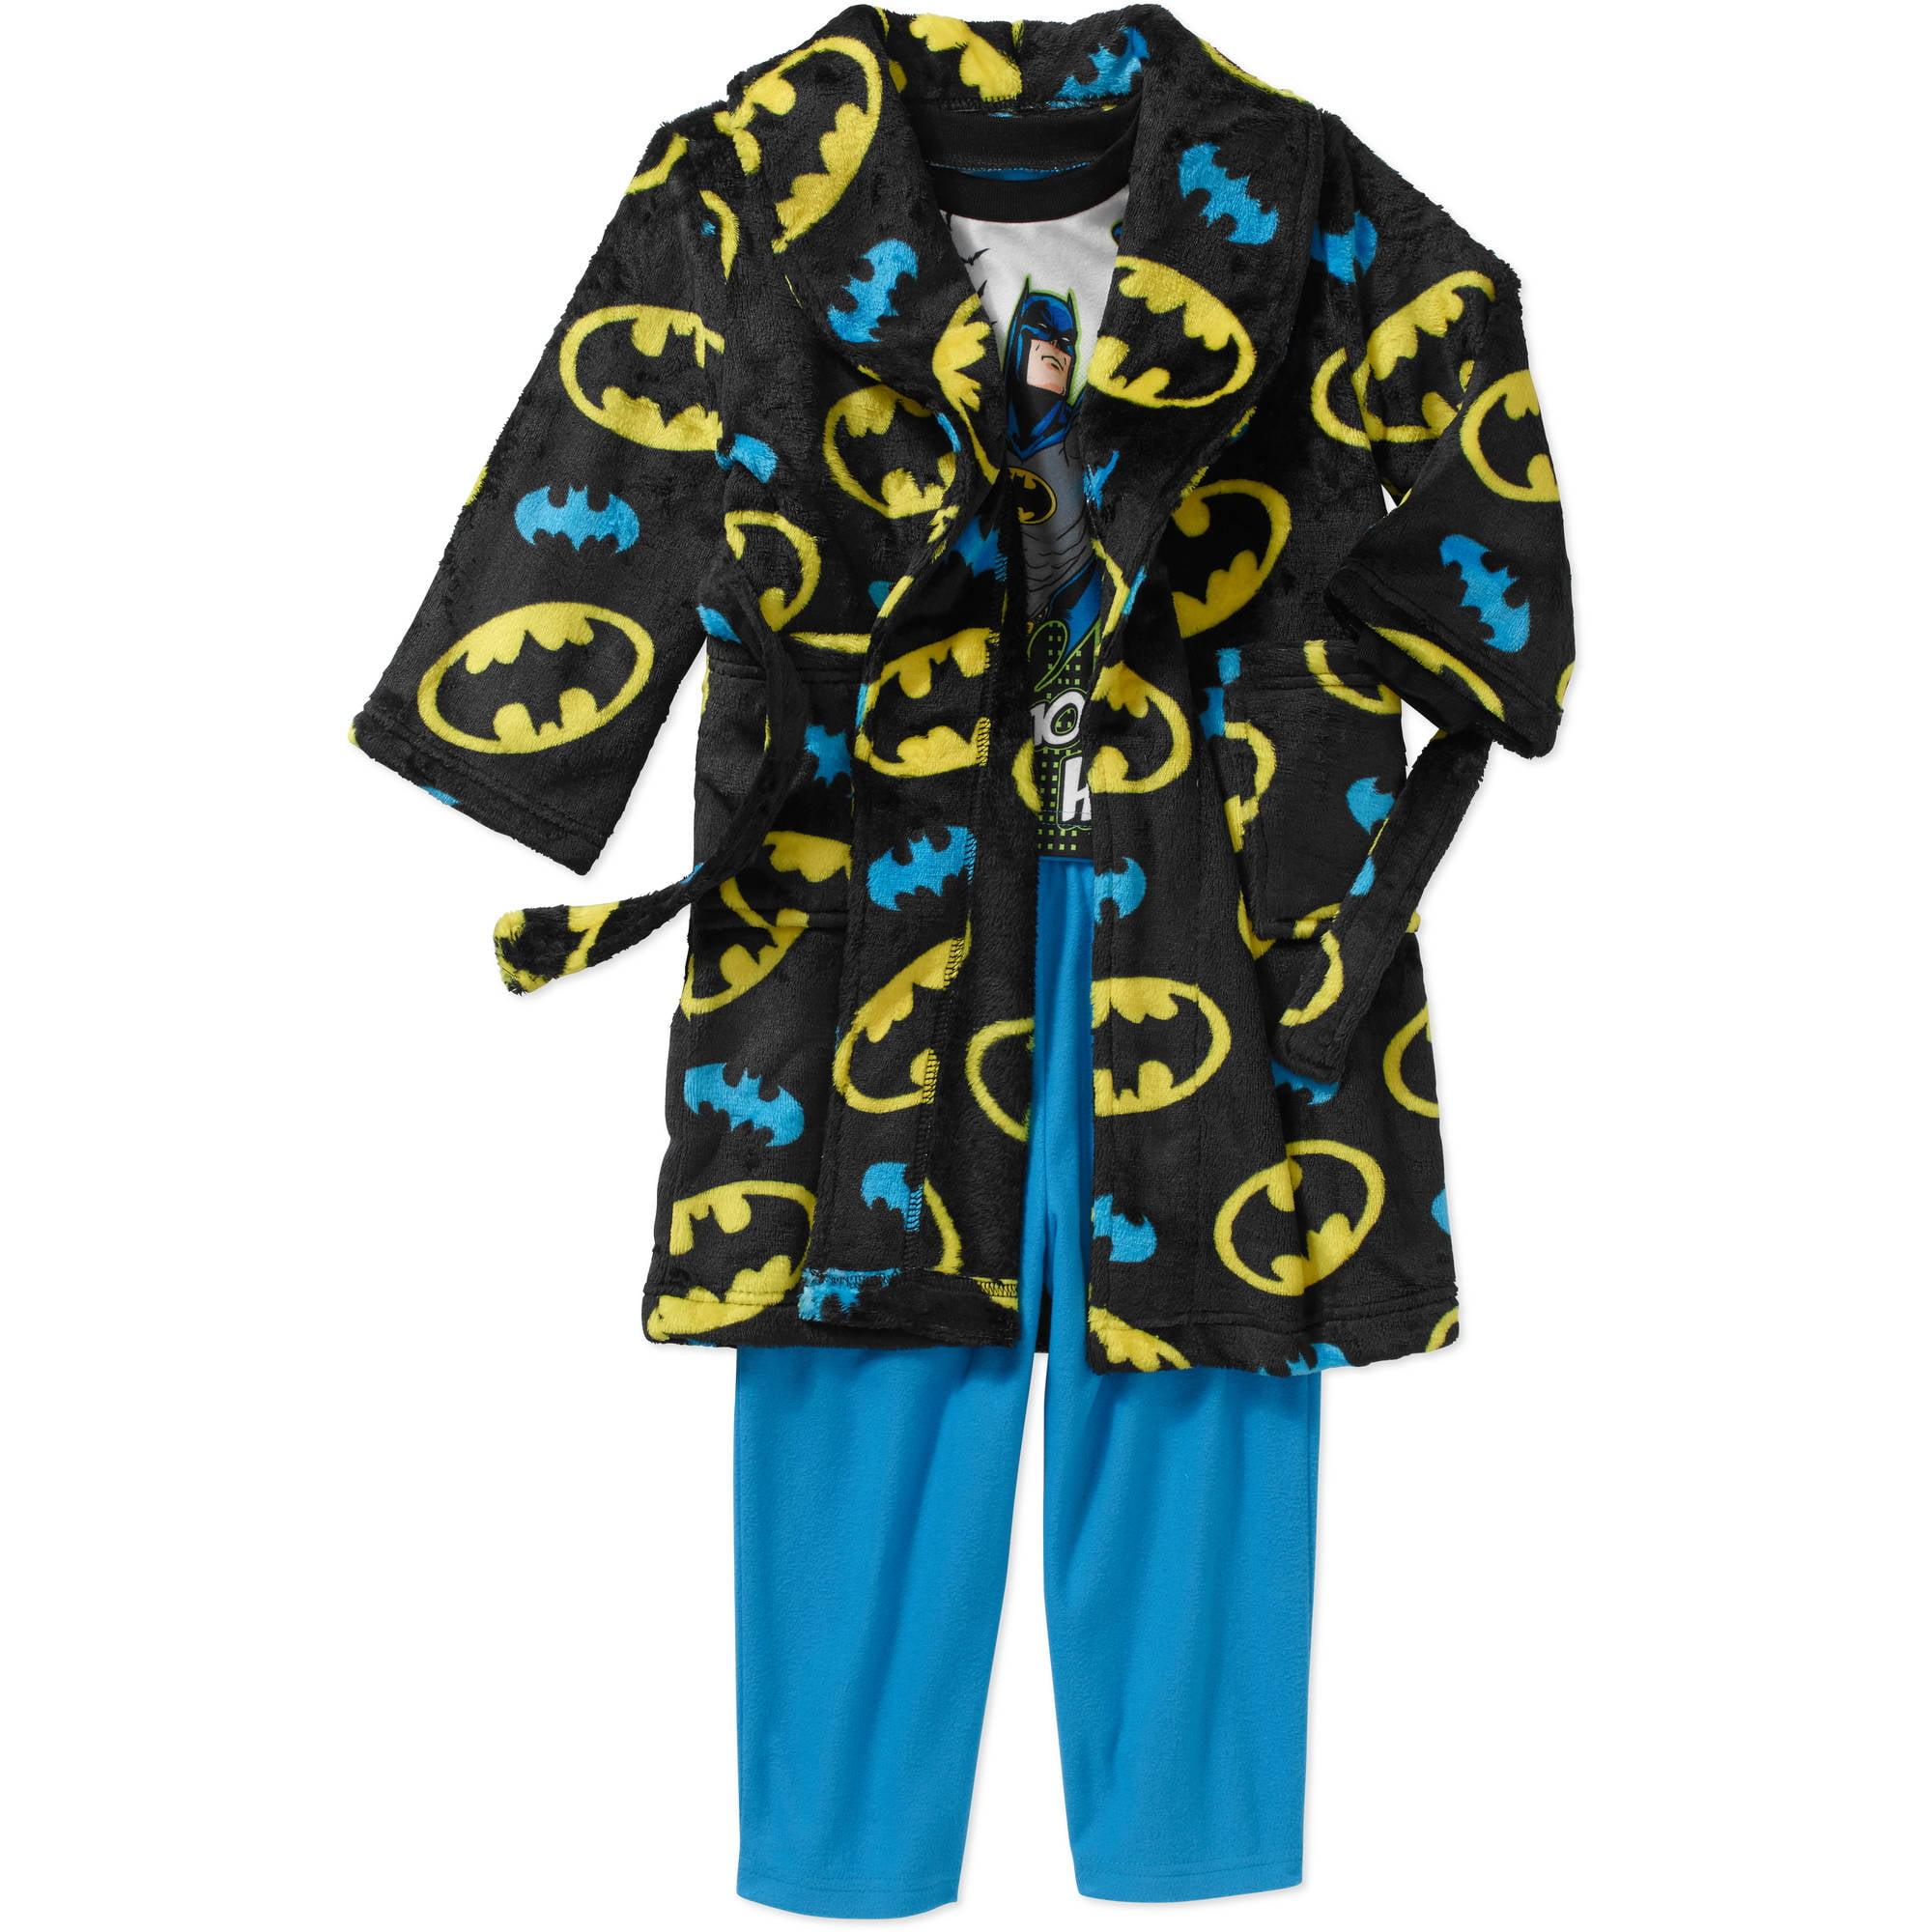 Batman Toddler Boy Robe and Pajama 3-Piece Sleepwear Gift ...